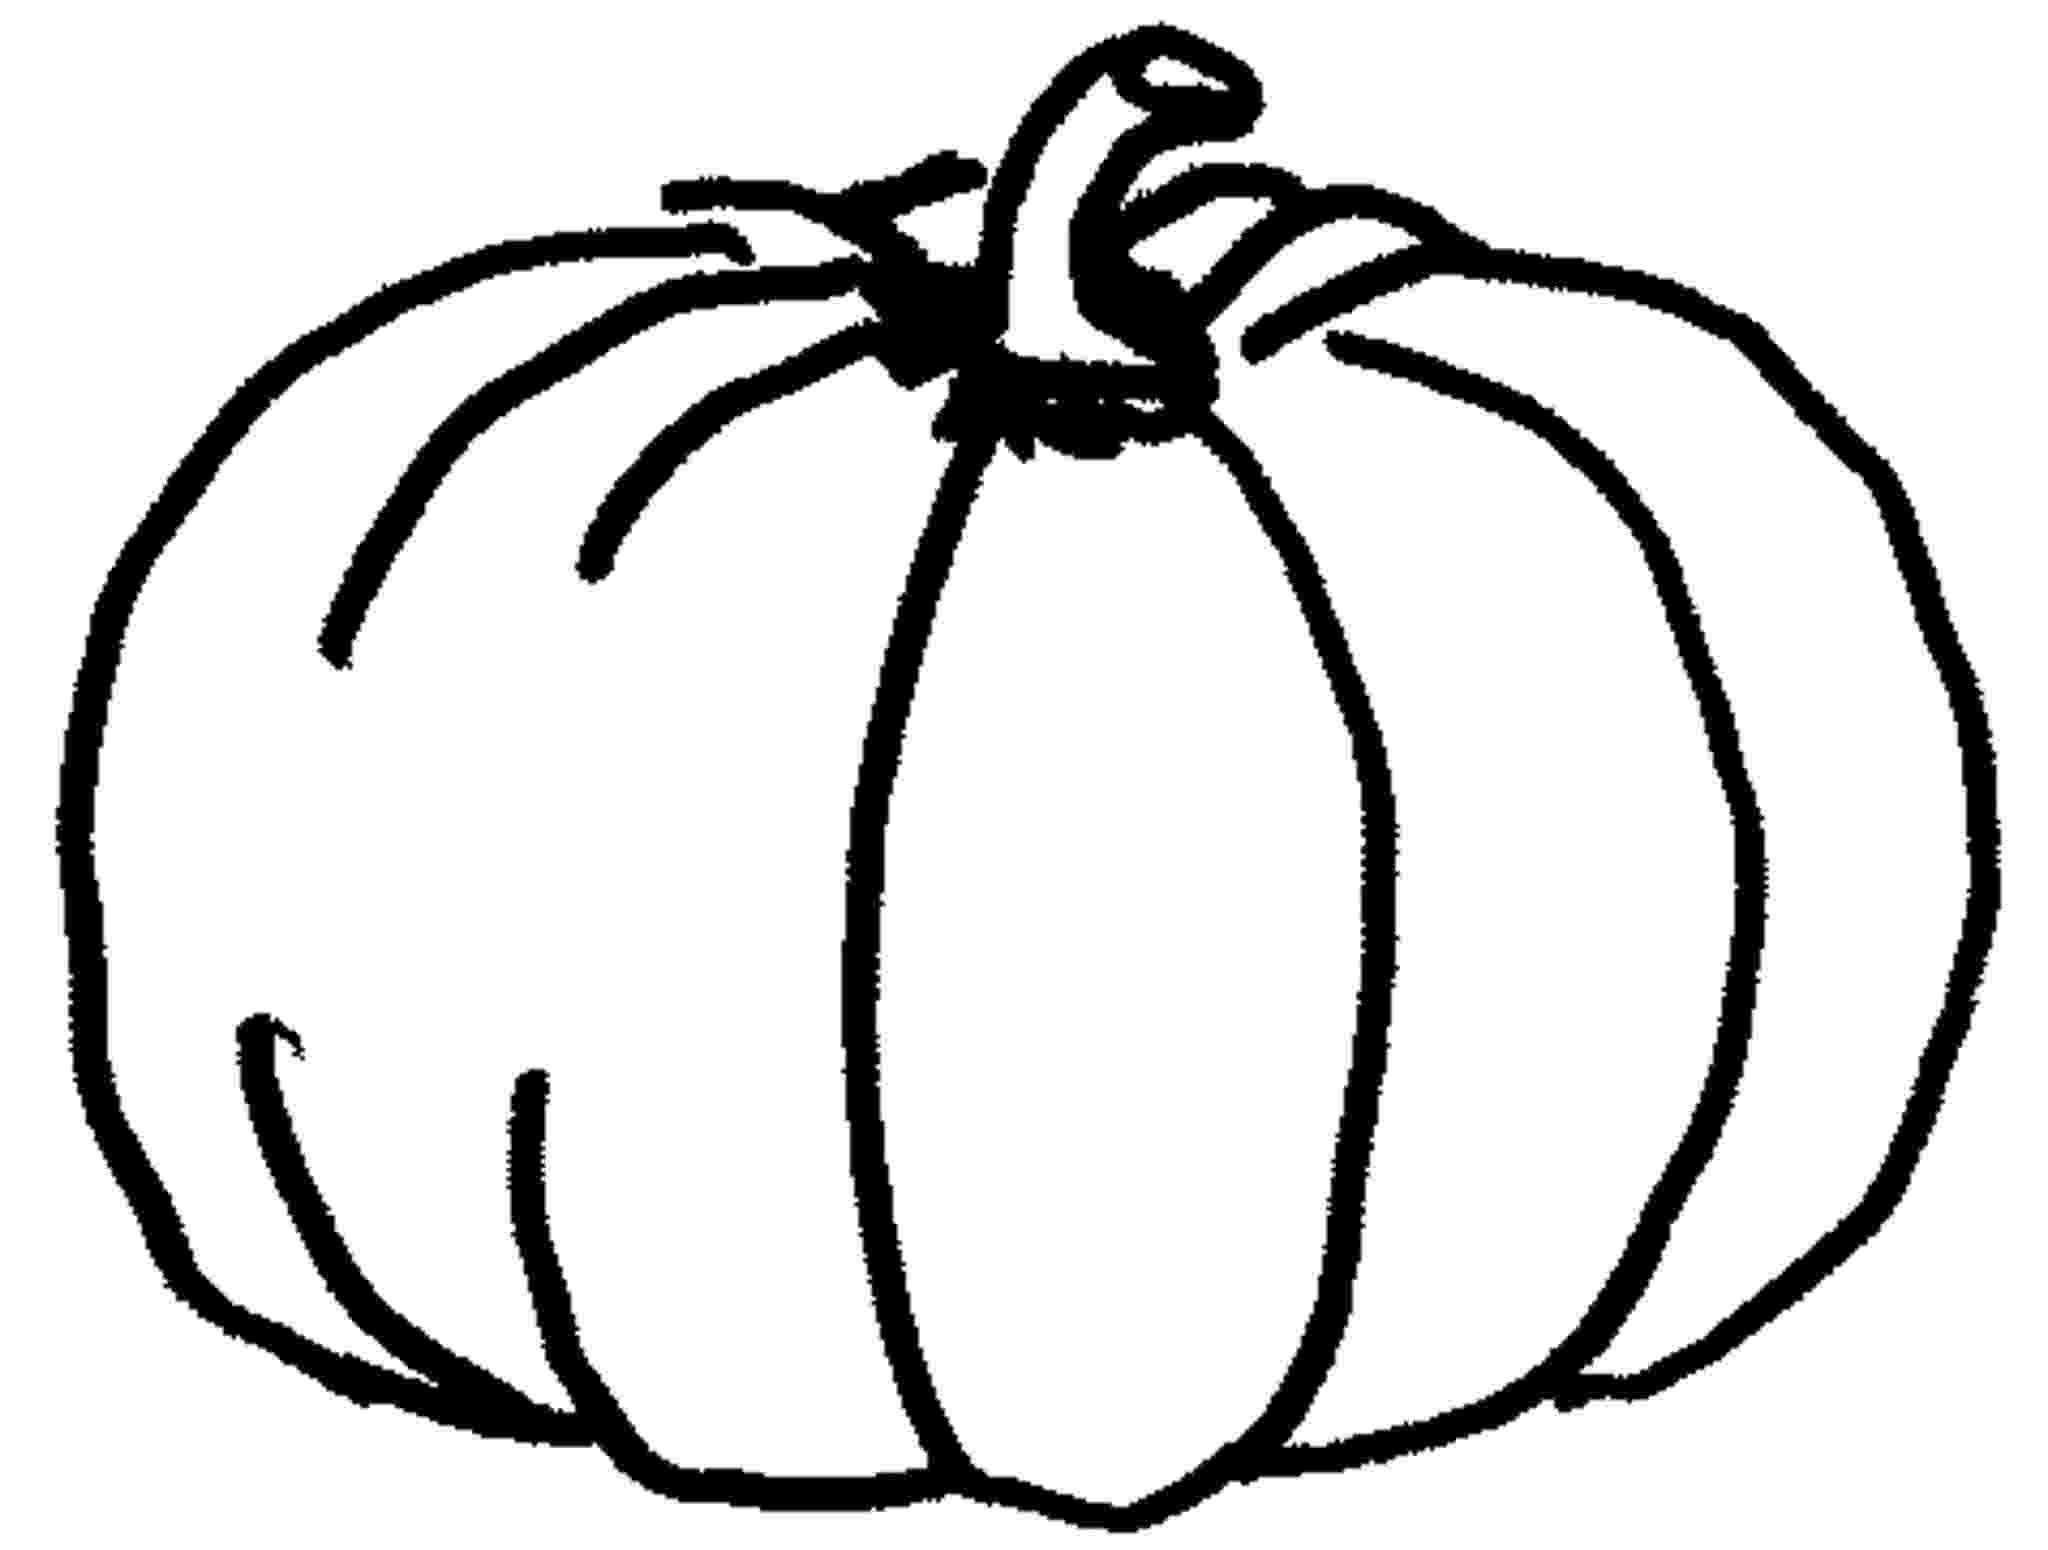 pumpkin coloring sheets printable pumpkin coloring pages getcoloringpagescom sheets pumpkin coloring printable